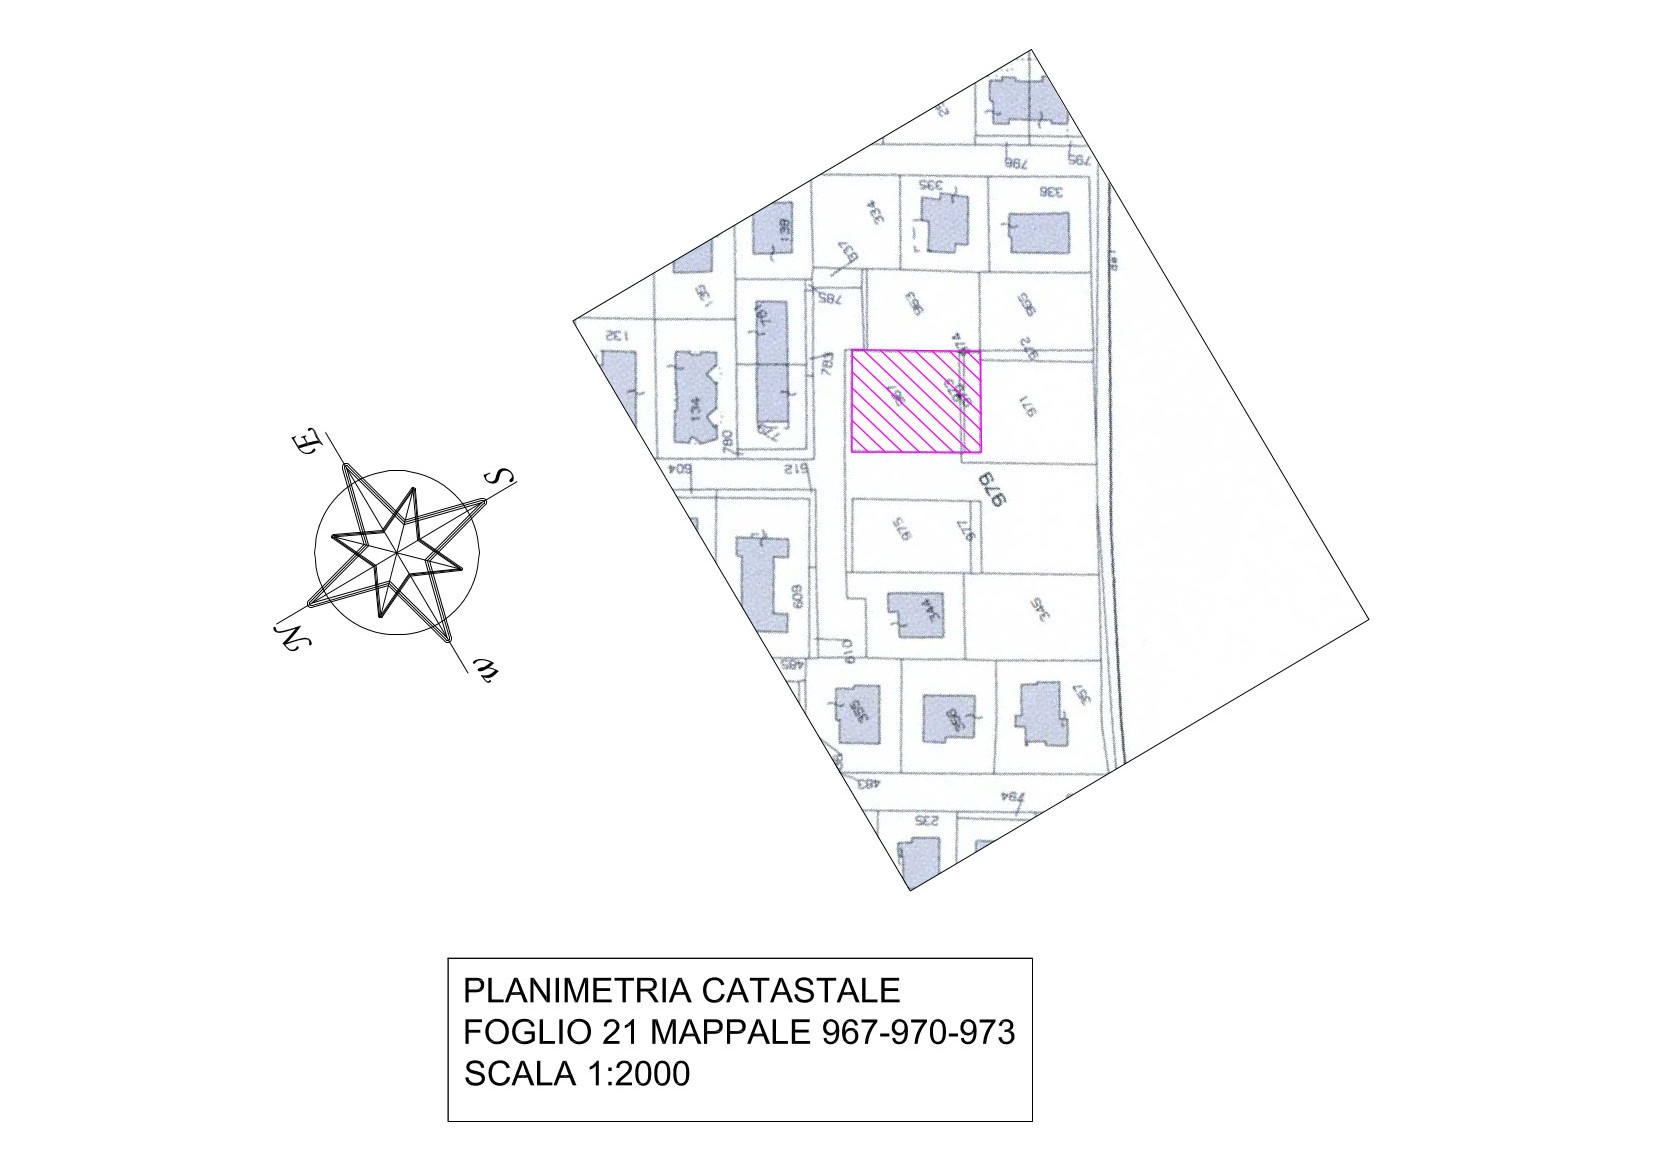 Planimetria castale